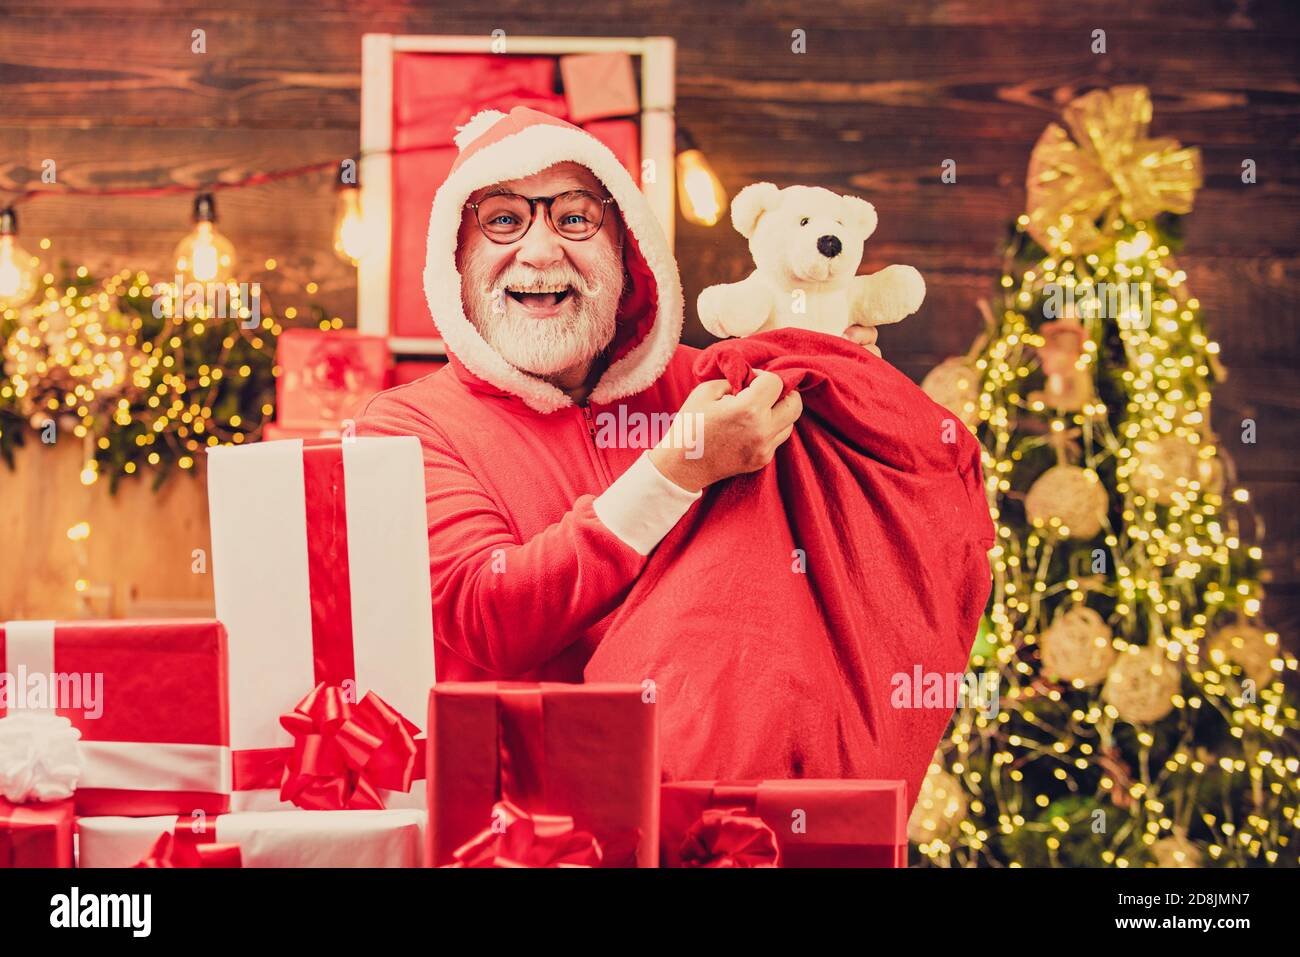 Christmas Tote Bag Shopper Xmas Holiday Funny Santa Father Funny Party Gift